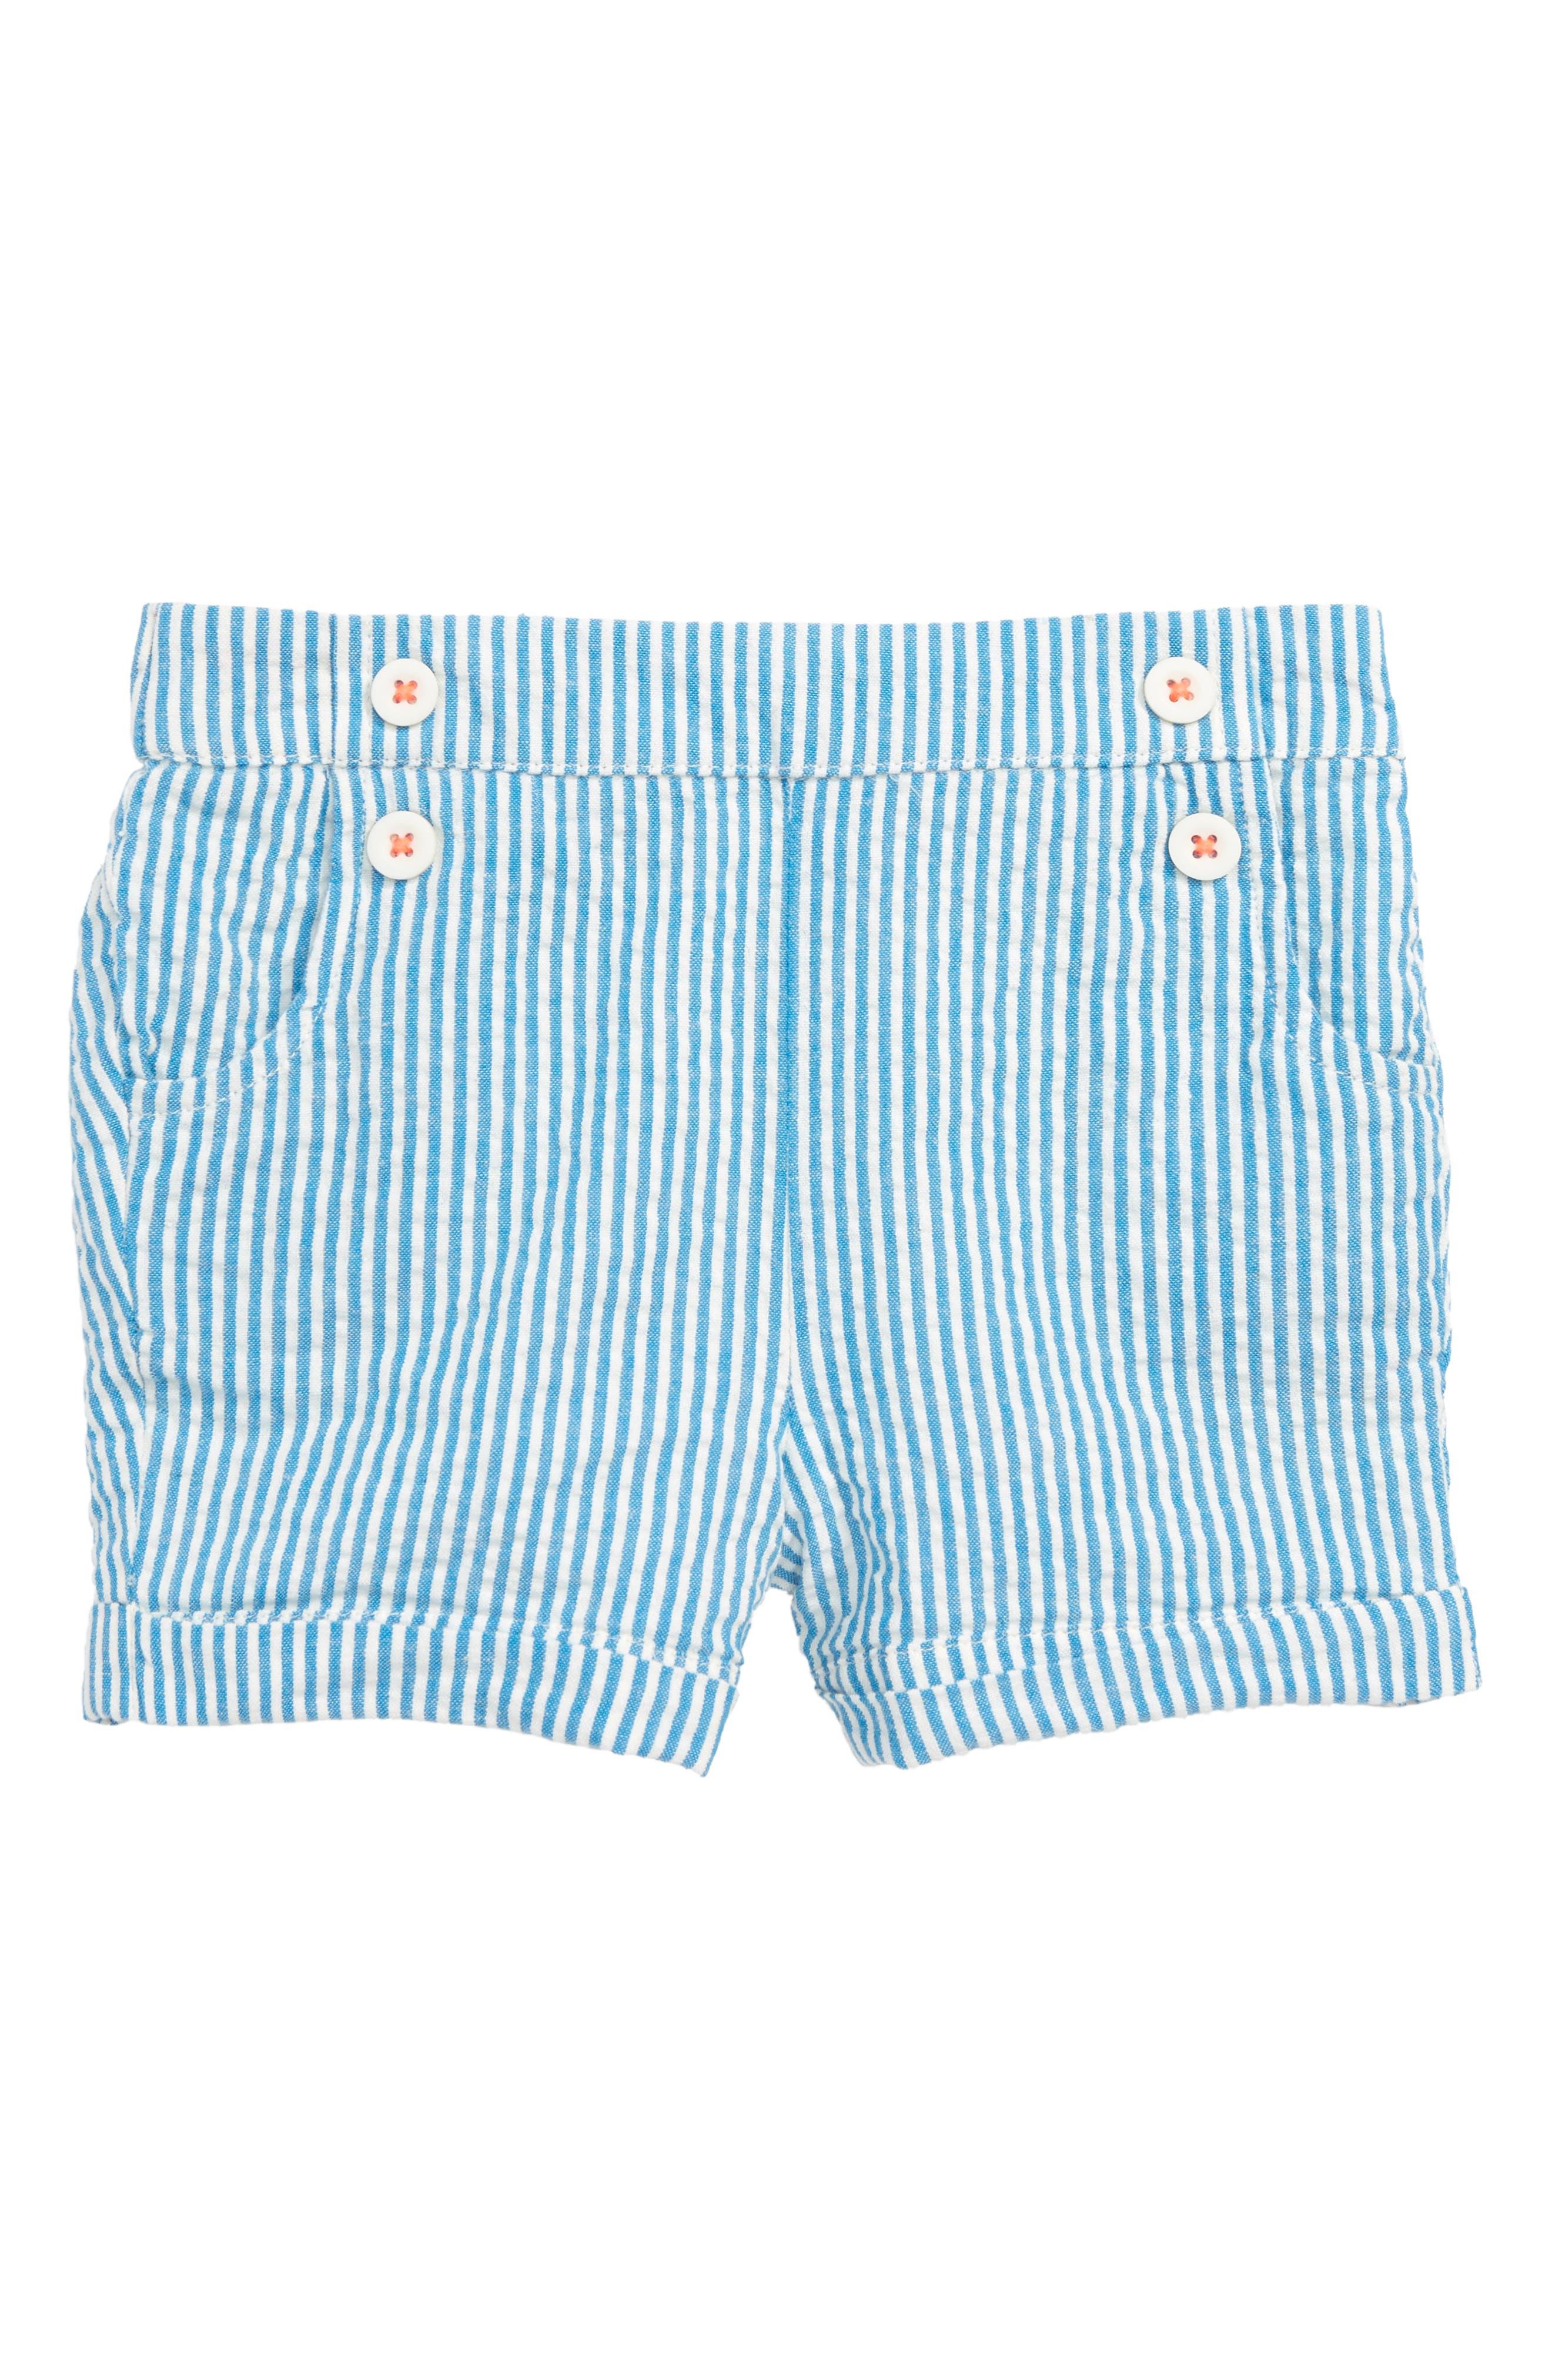 Mini Boden Seersucker Shorts (Baby Girls & Toddler Girls)